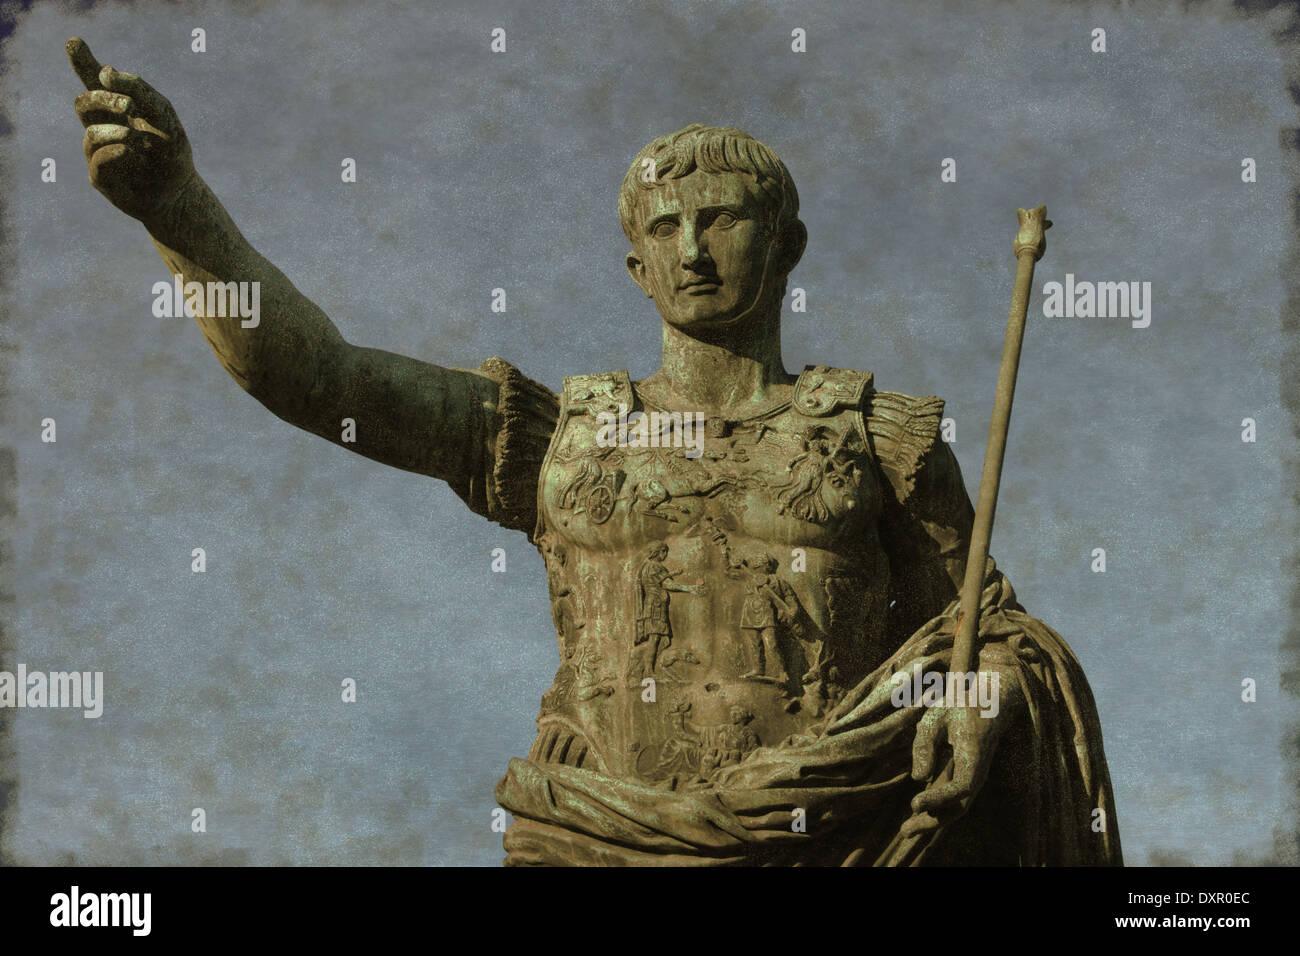 Vintage image of the Roman emperor Augustus, symbol of power Stock Photo